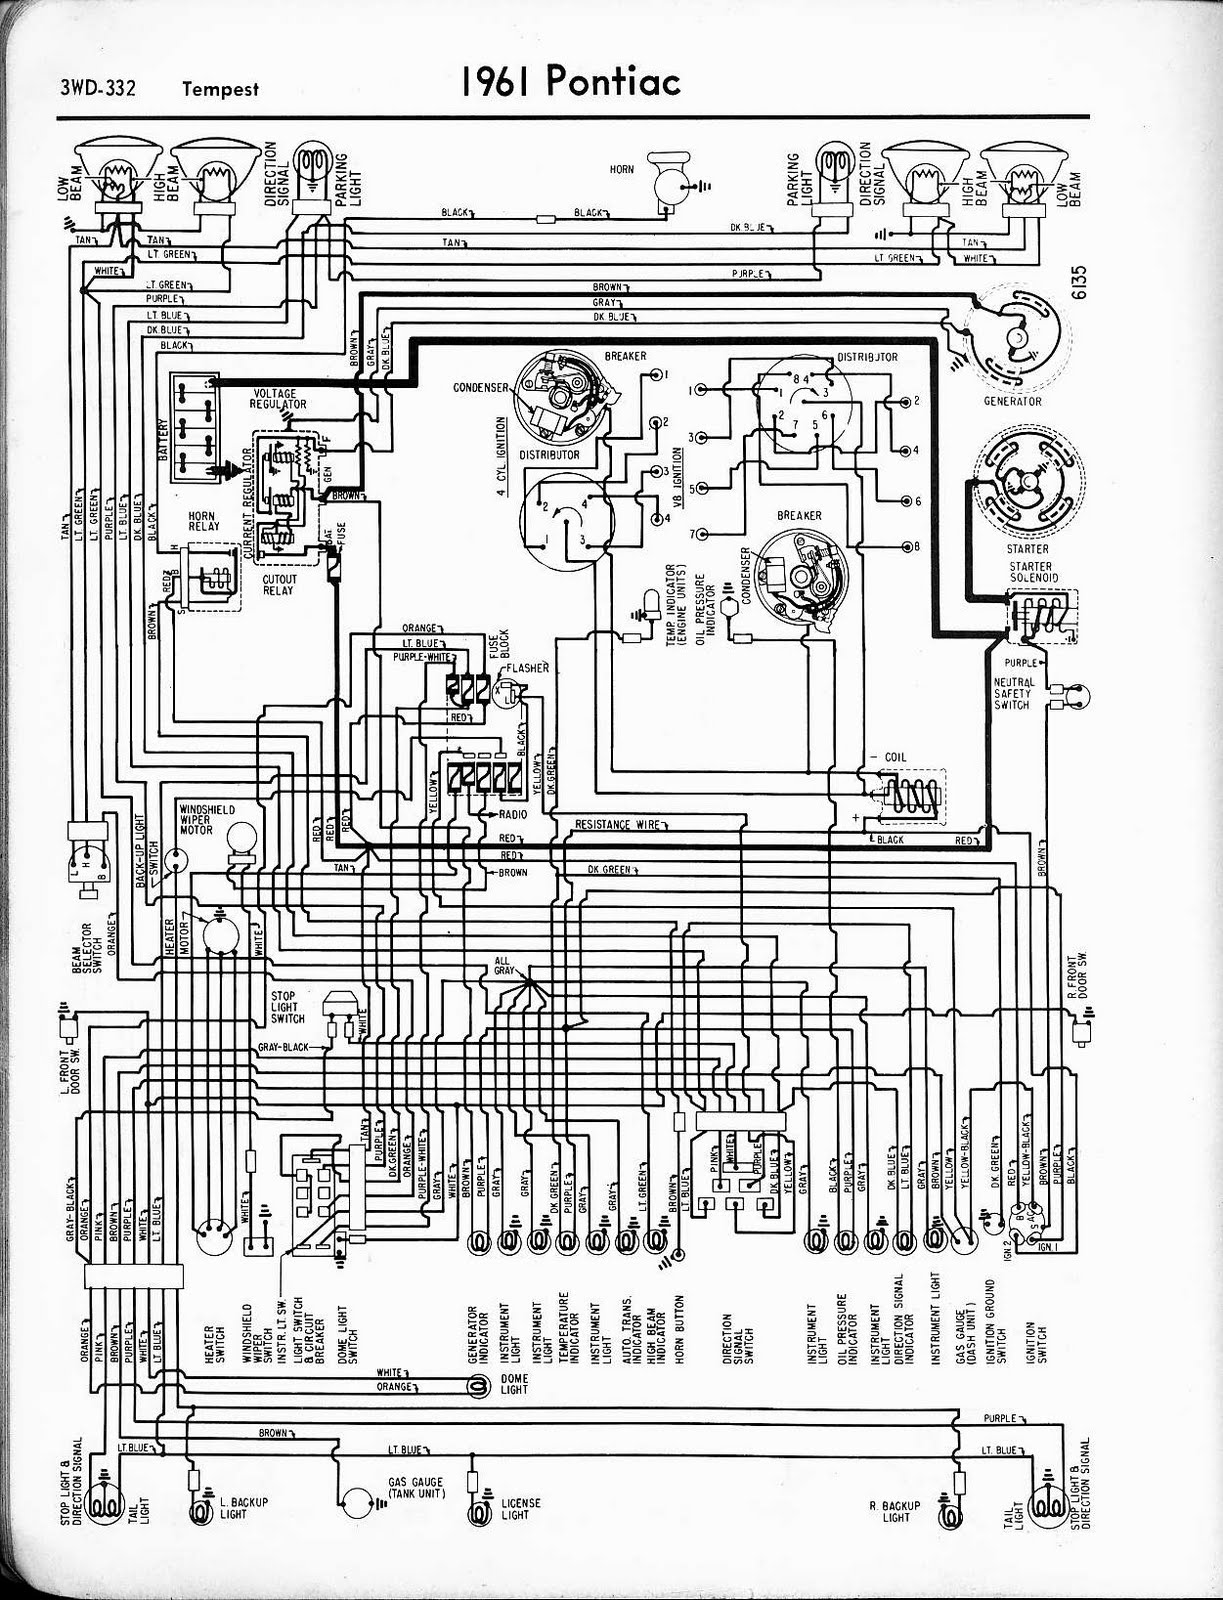 Free Auto Wiring Diagram: 1961 Pontiac Tempest Wiring Diagram